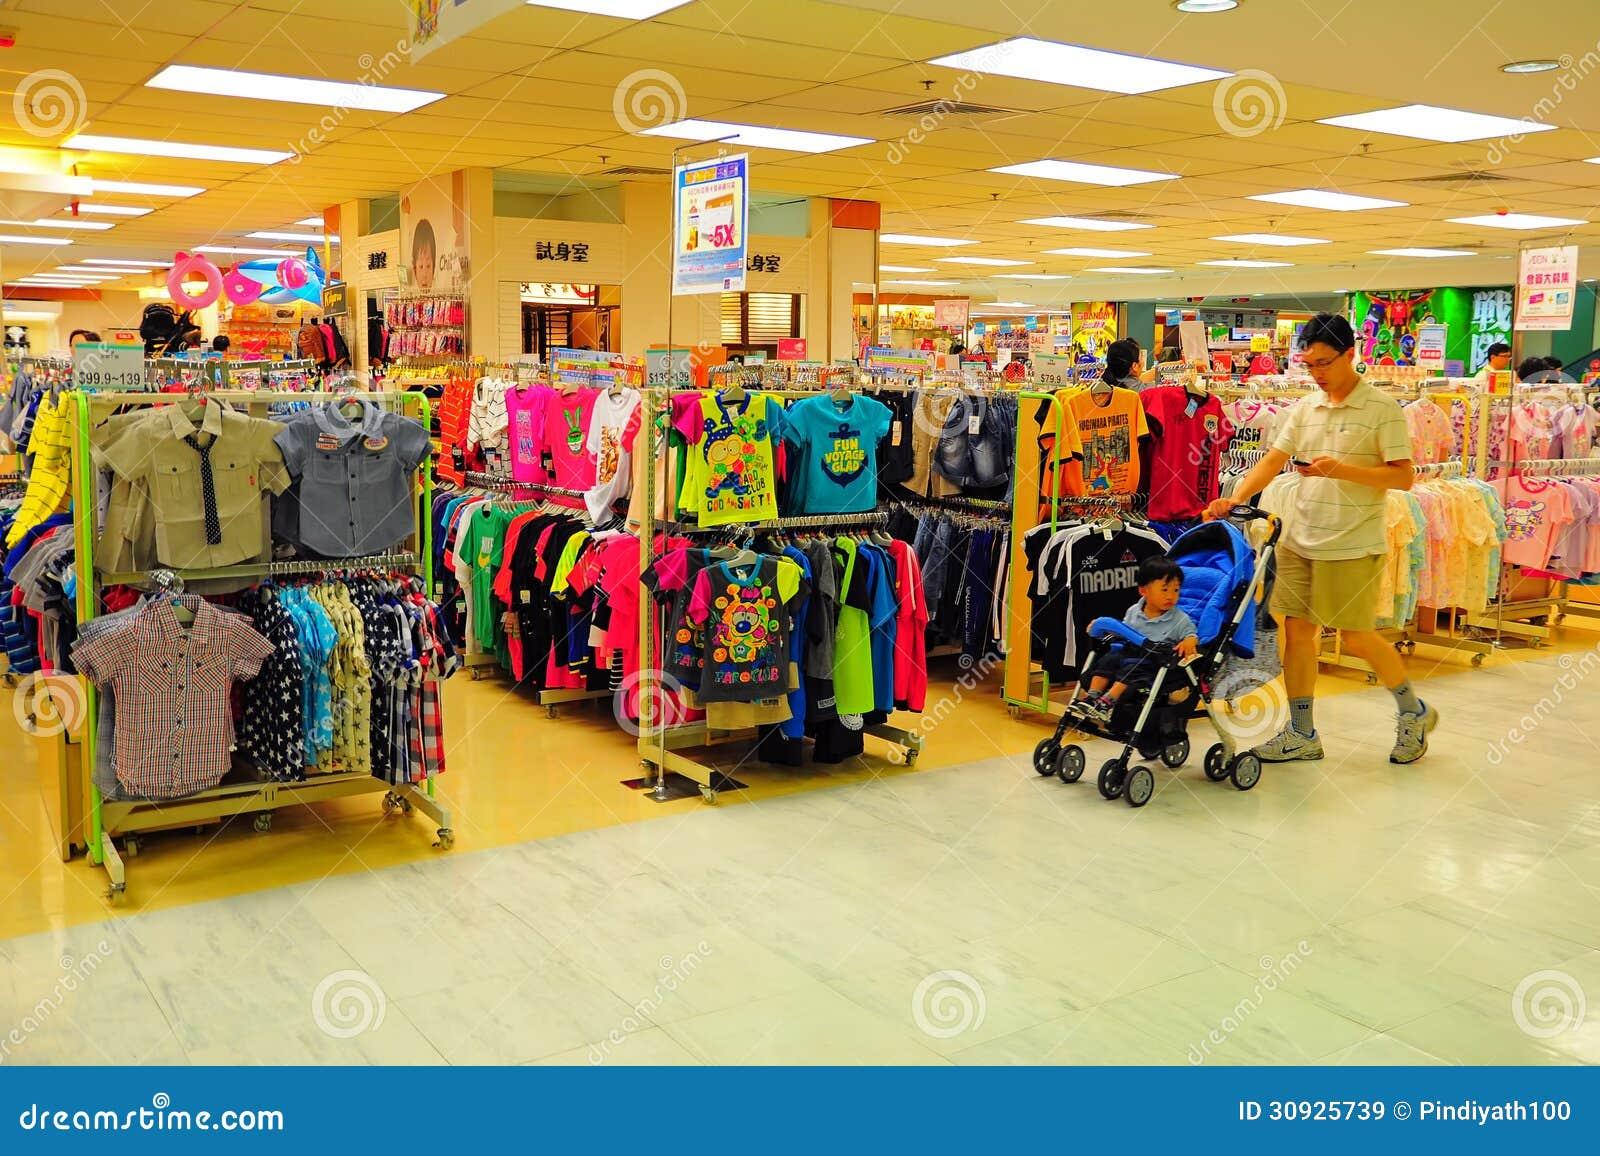 Cheap clothing stores. Casanova clothing store